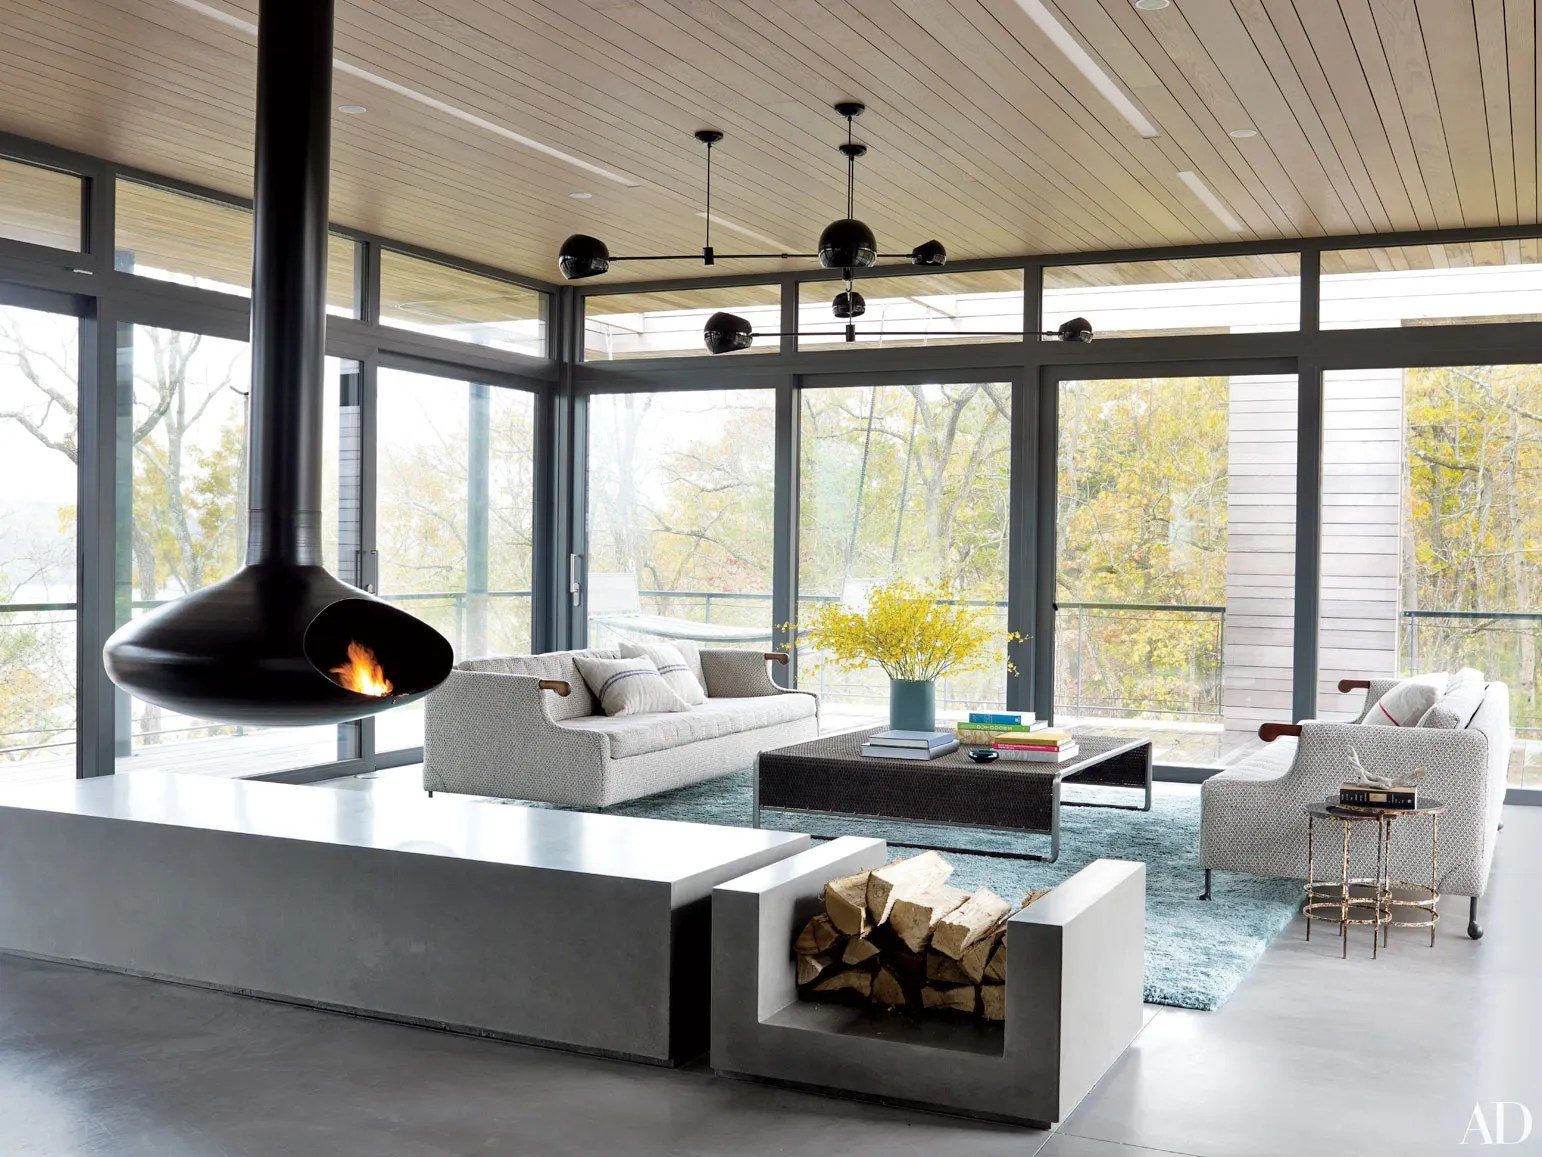 23 Distinctive Fireplace Designs Photos  Architectural Digest